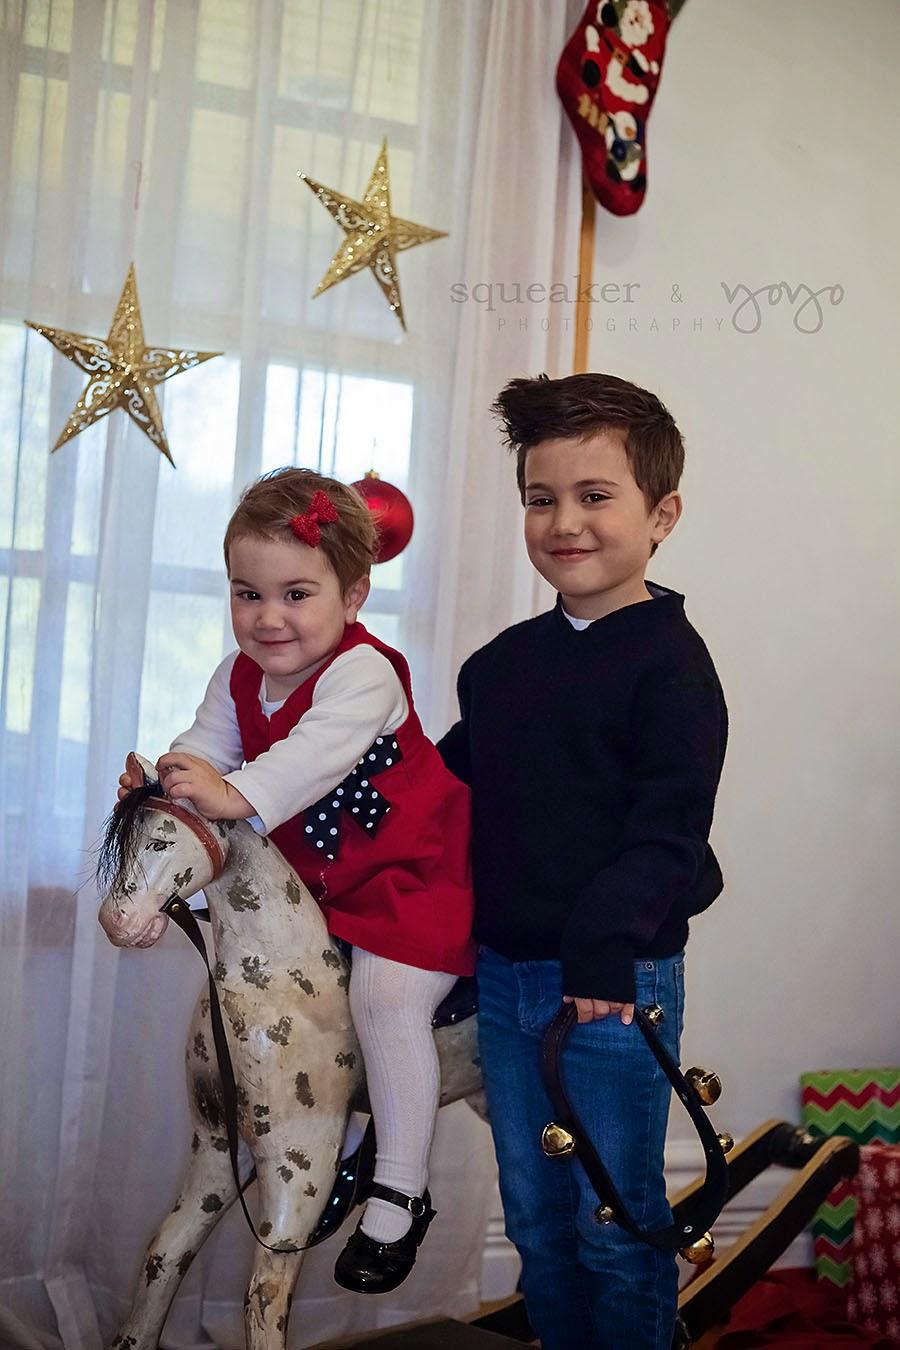 Private Santa Visit, Santa Experience, Ontario, Santa photos, meet Santa, Christmas Photos, Holiday Card Photos